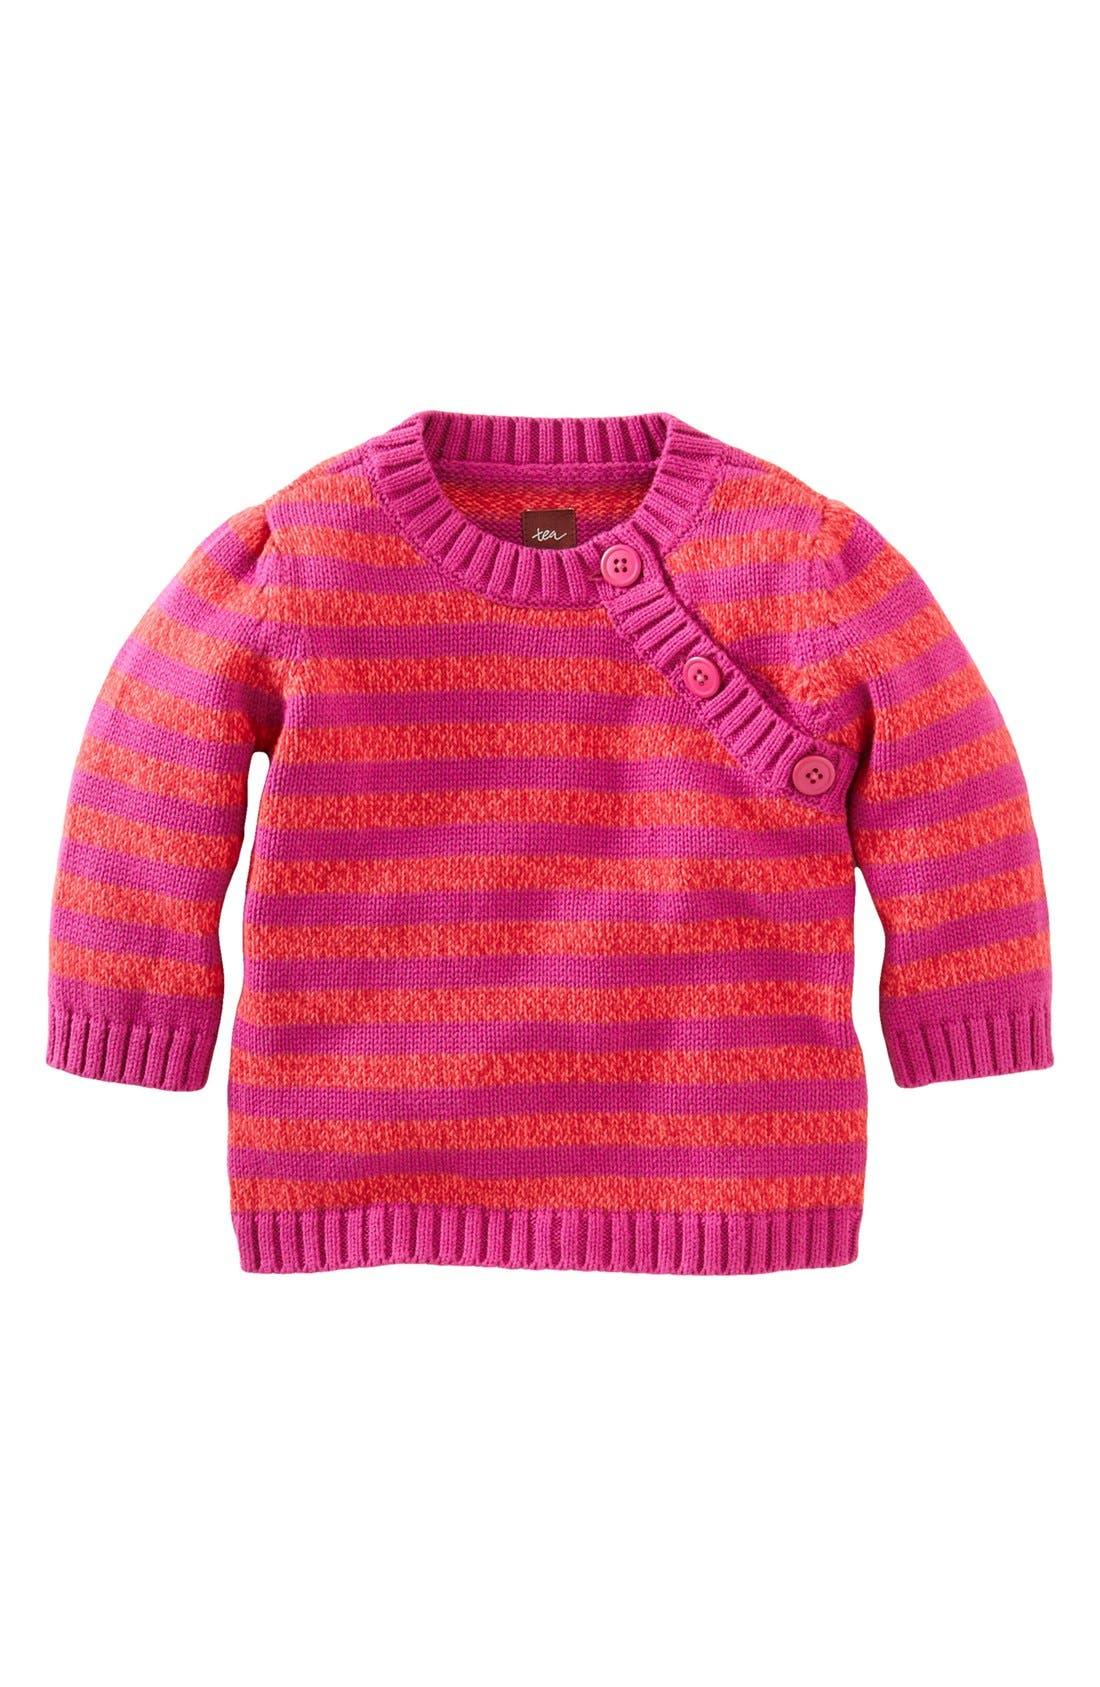 Alternate Image 1 Selected - Tea Collection Marled Stripe Sweater (Little Girls & Big Girls)